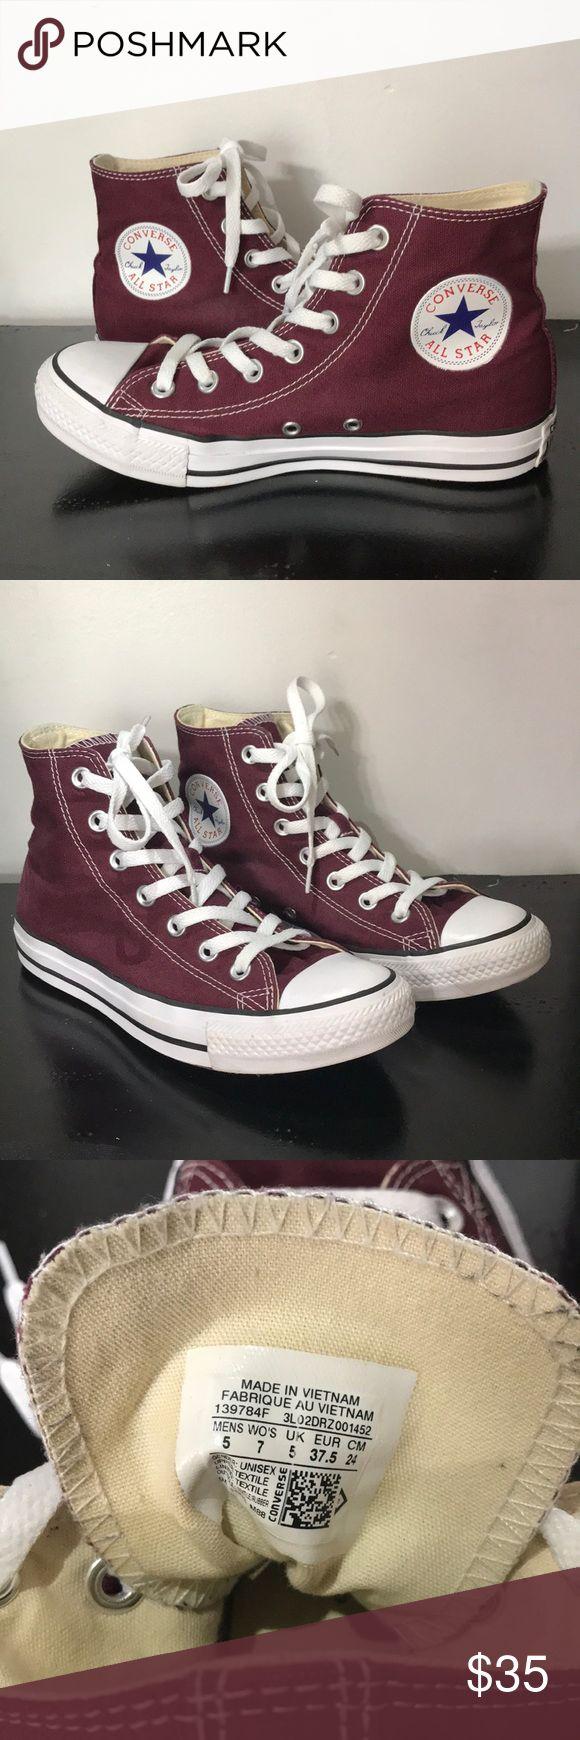 I just added this listing on Poshmark: Unisex Maroon/burgundy high top converse. #shopmycloset #poshmark #fashion #shopping #style #forsale #Converse #Shoes